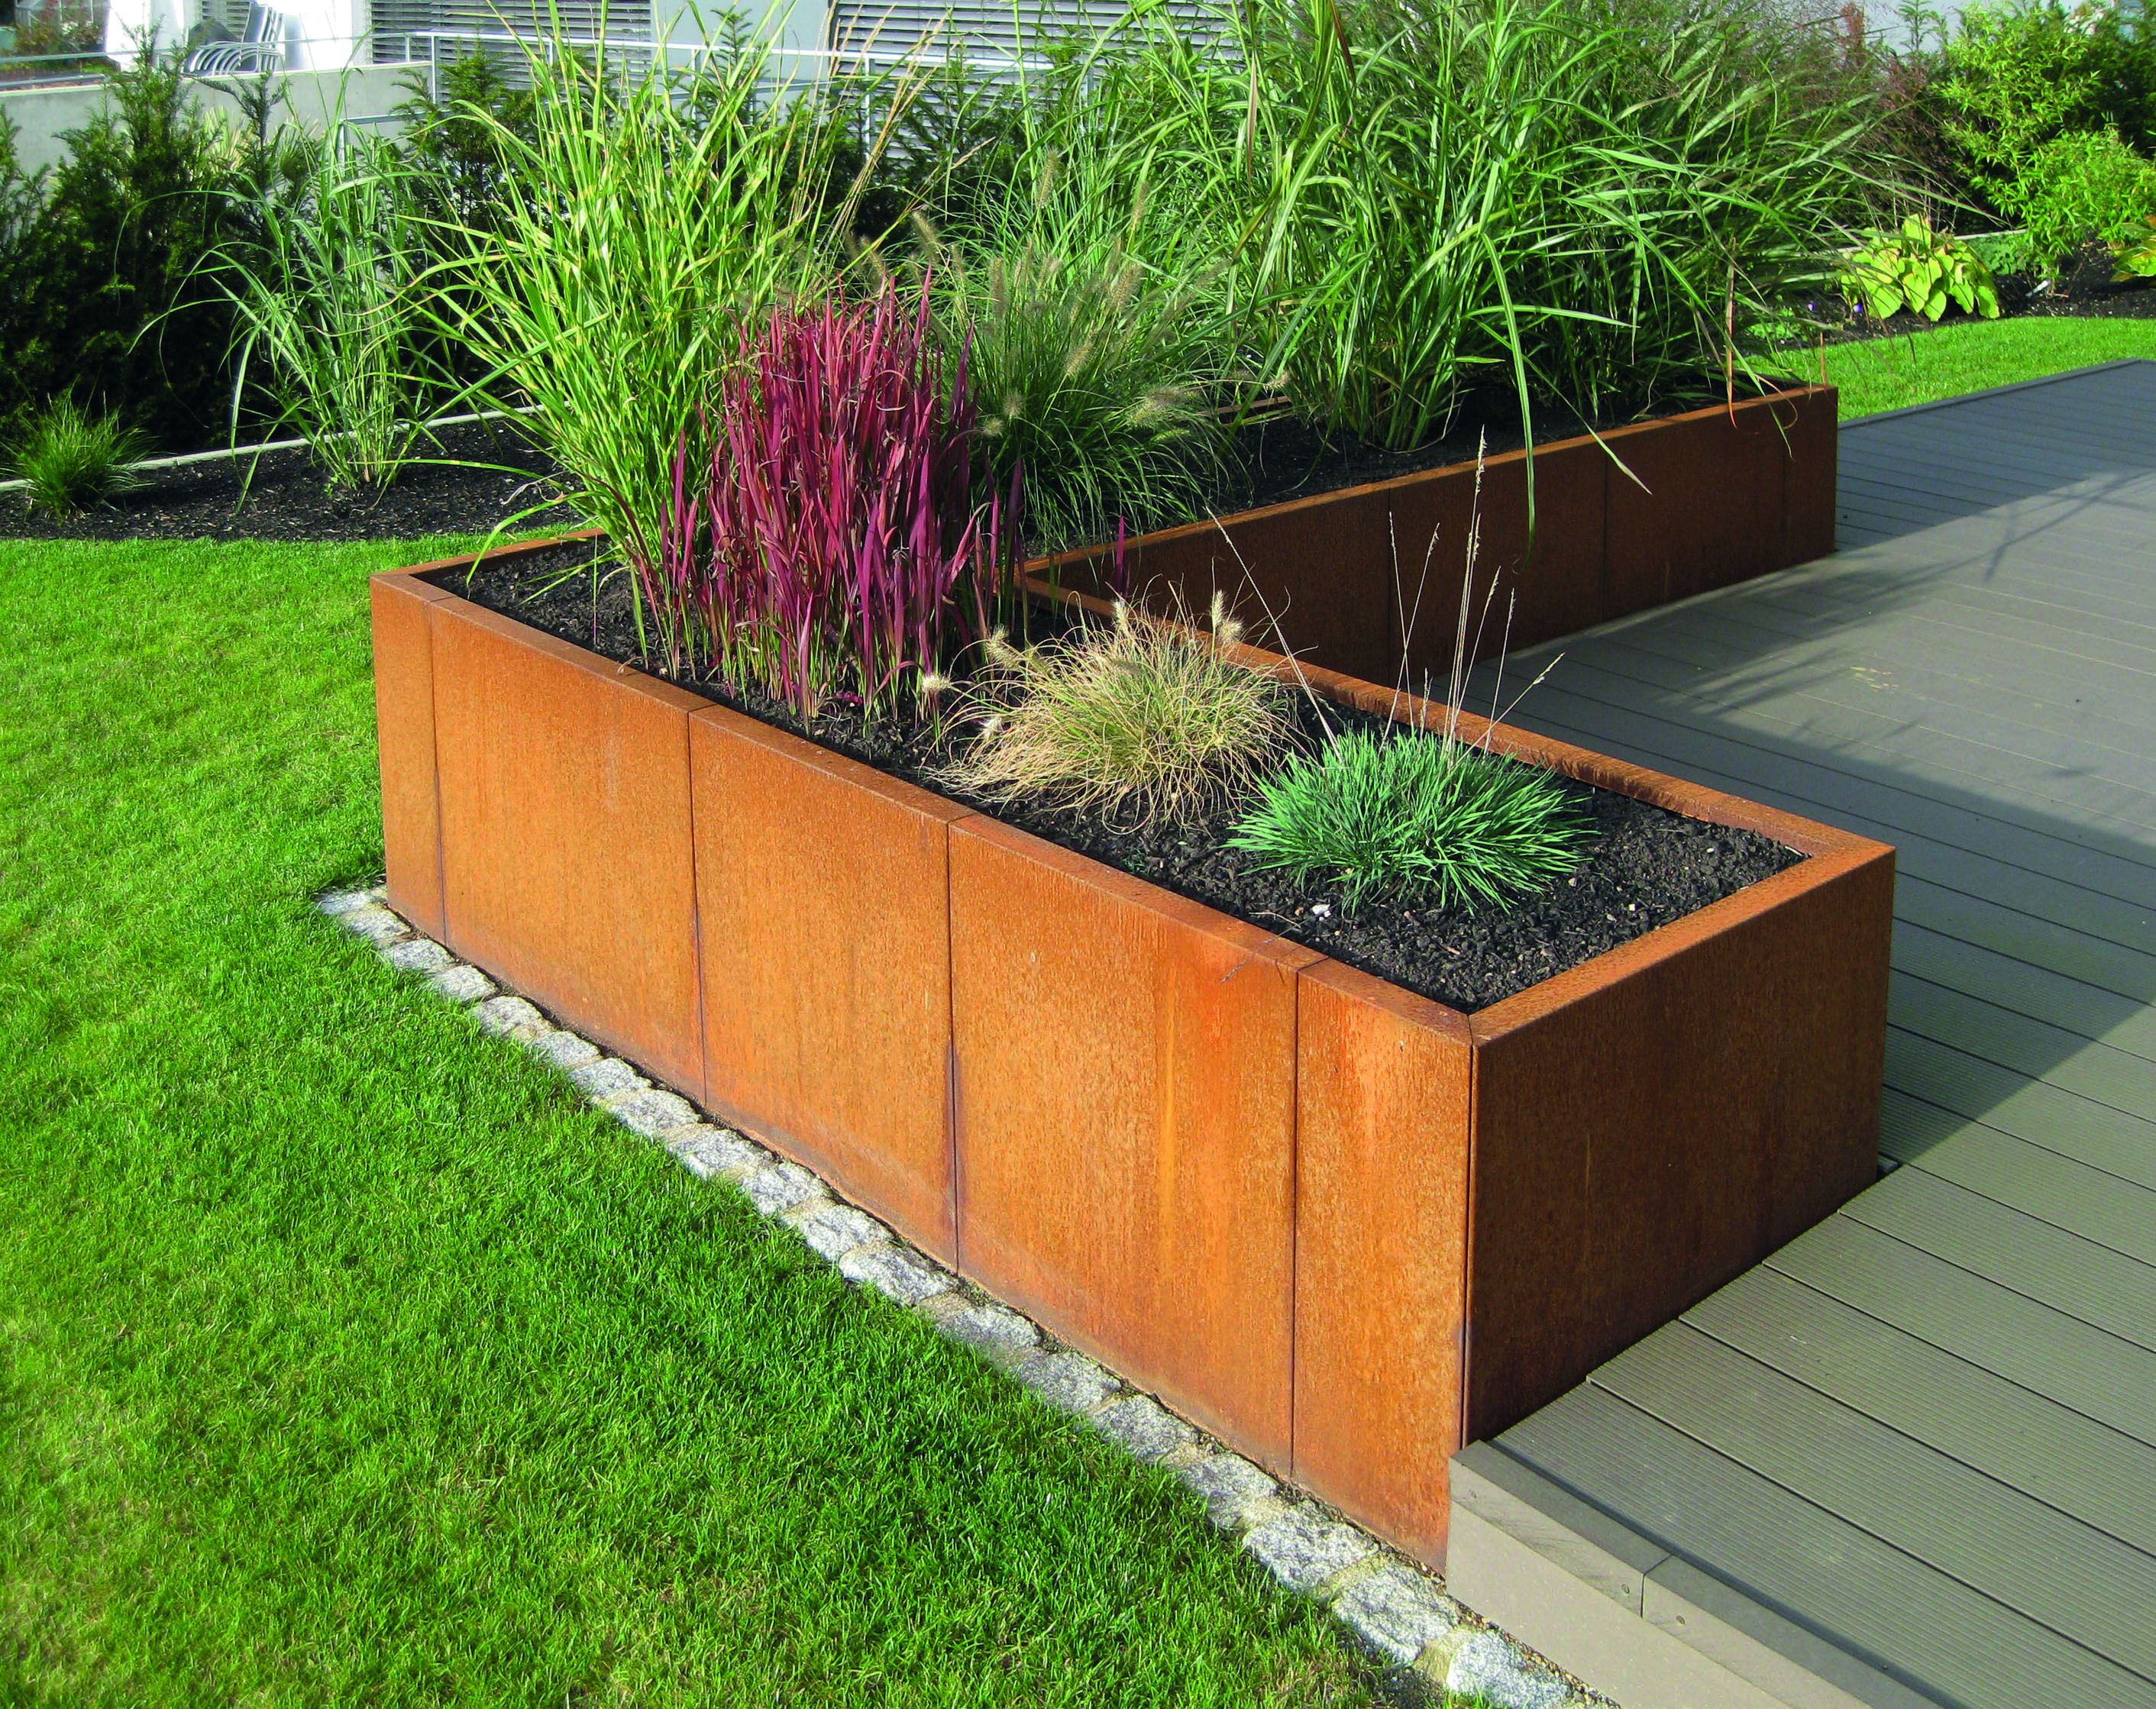 Mit Hochbeeten den Garten gestalten #gardenlandscaping